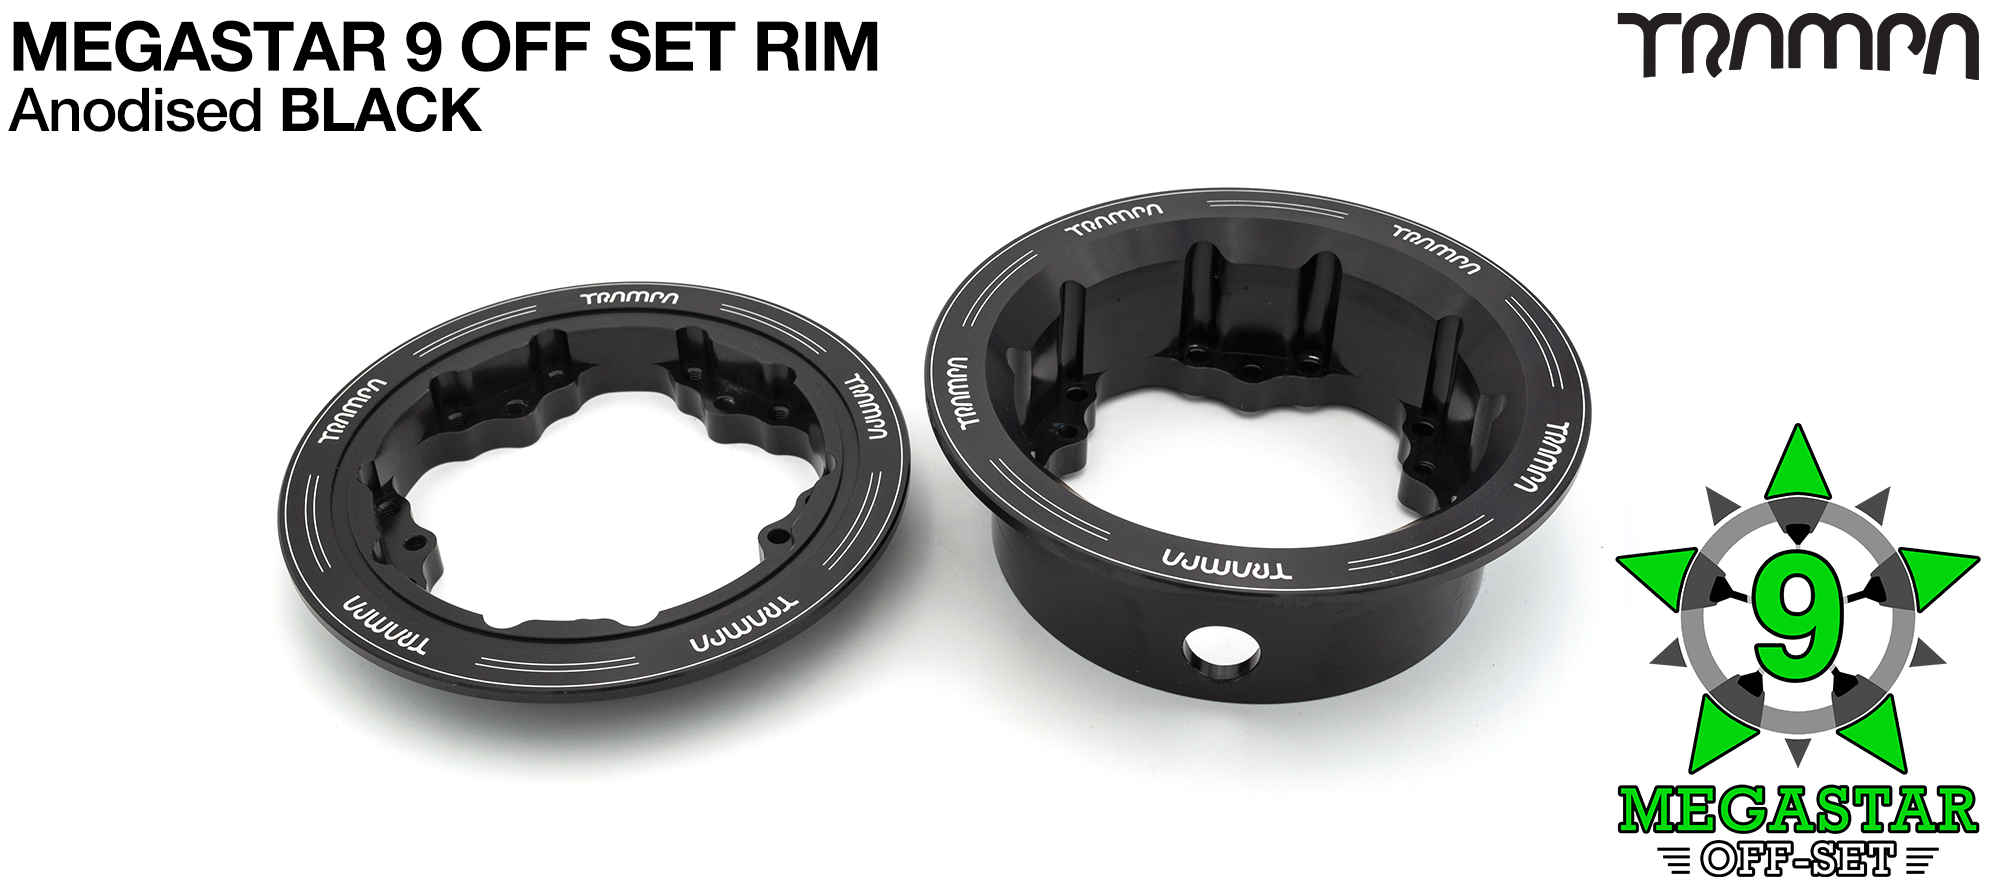 BLACK 9 Inch MEGASTAR Rims